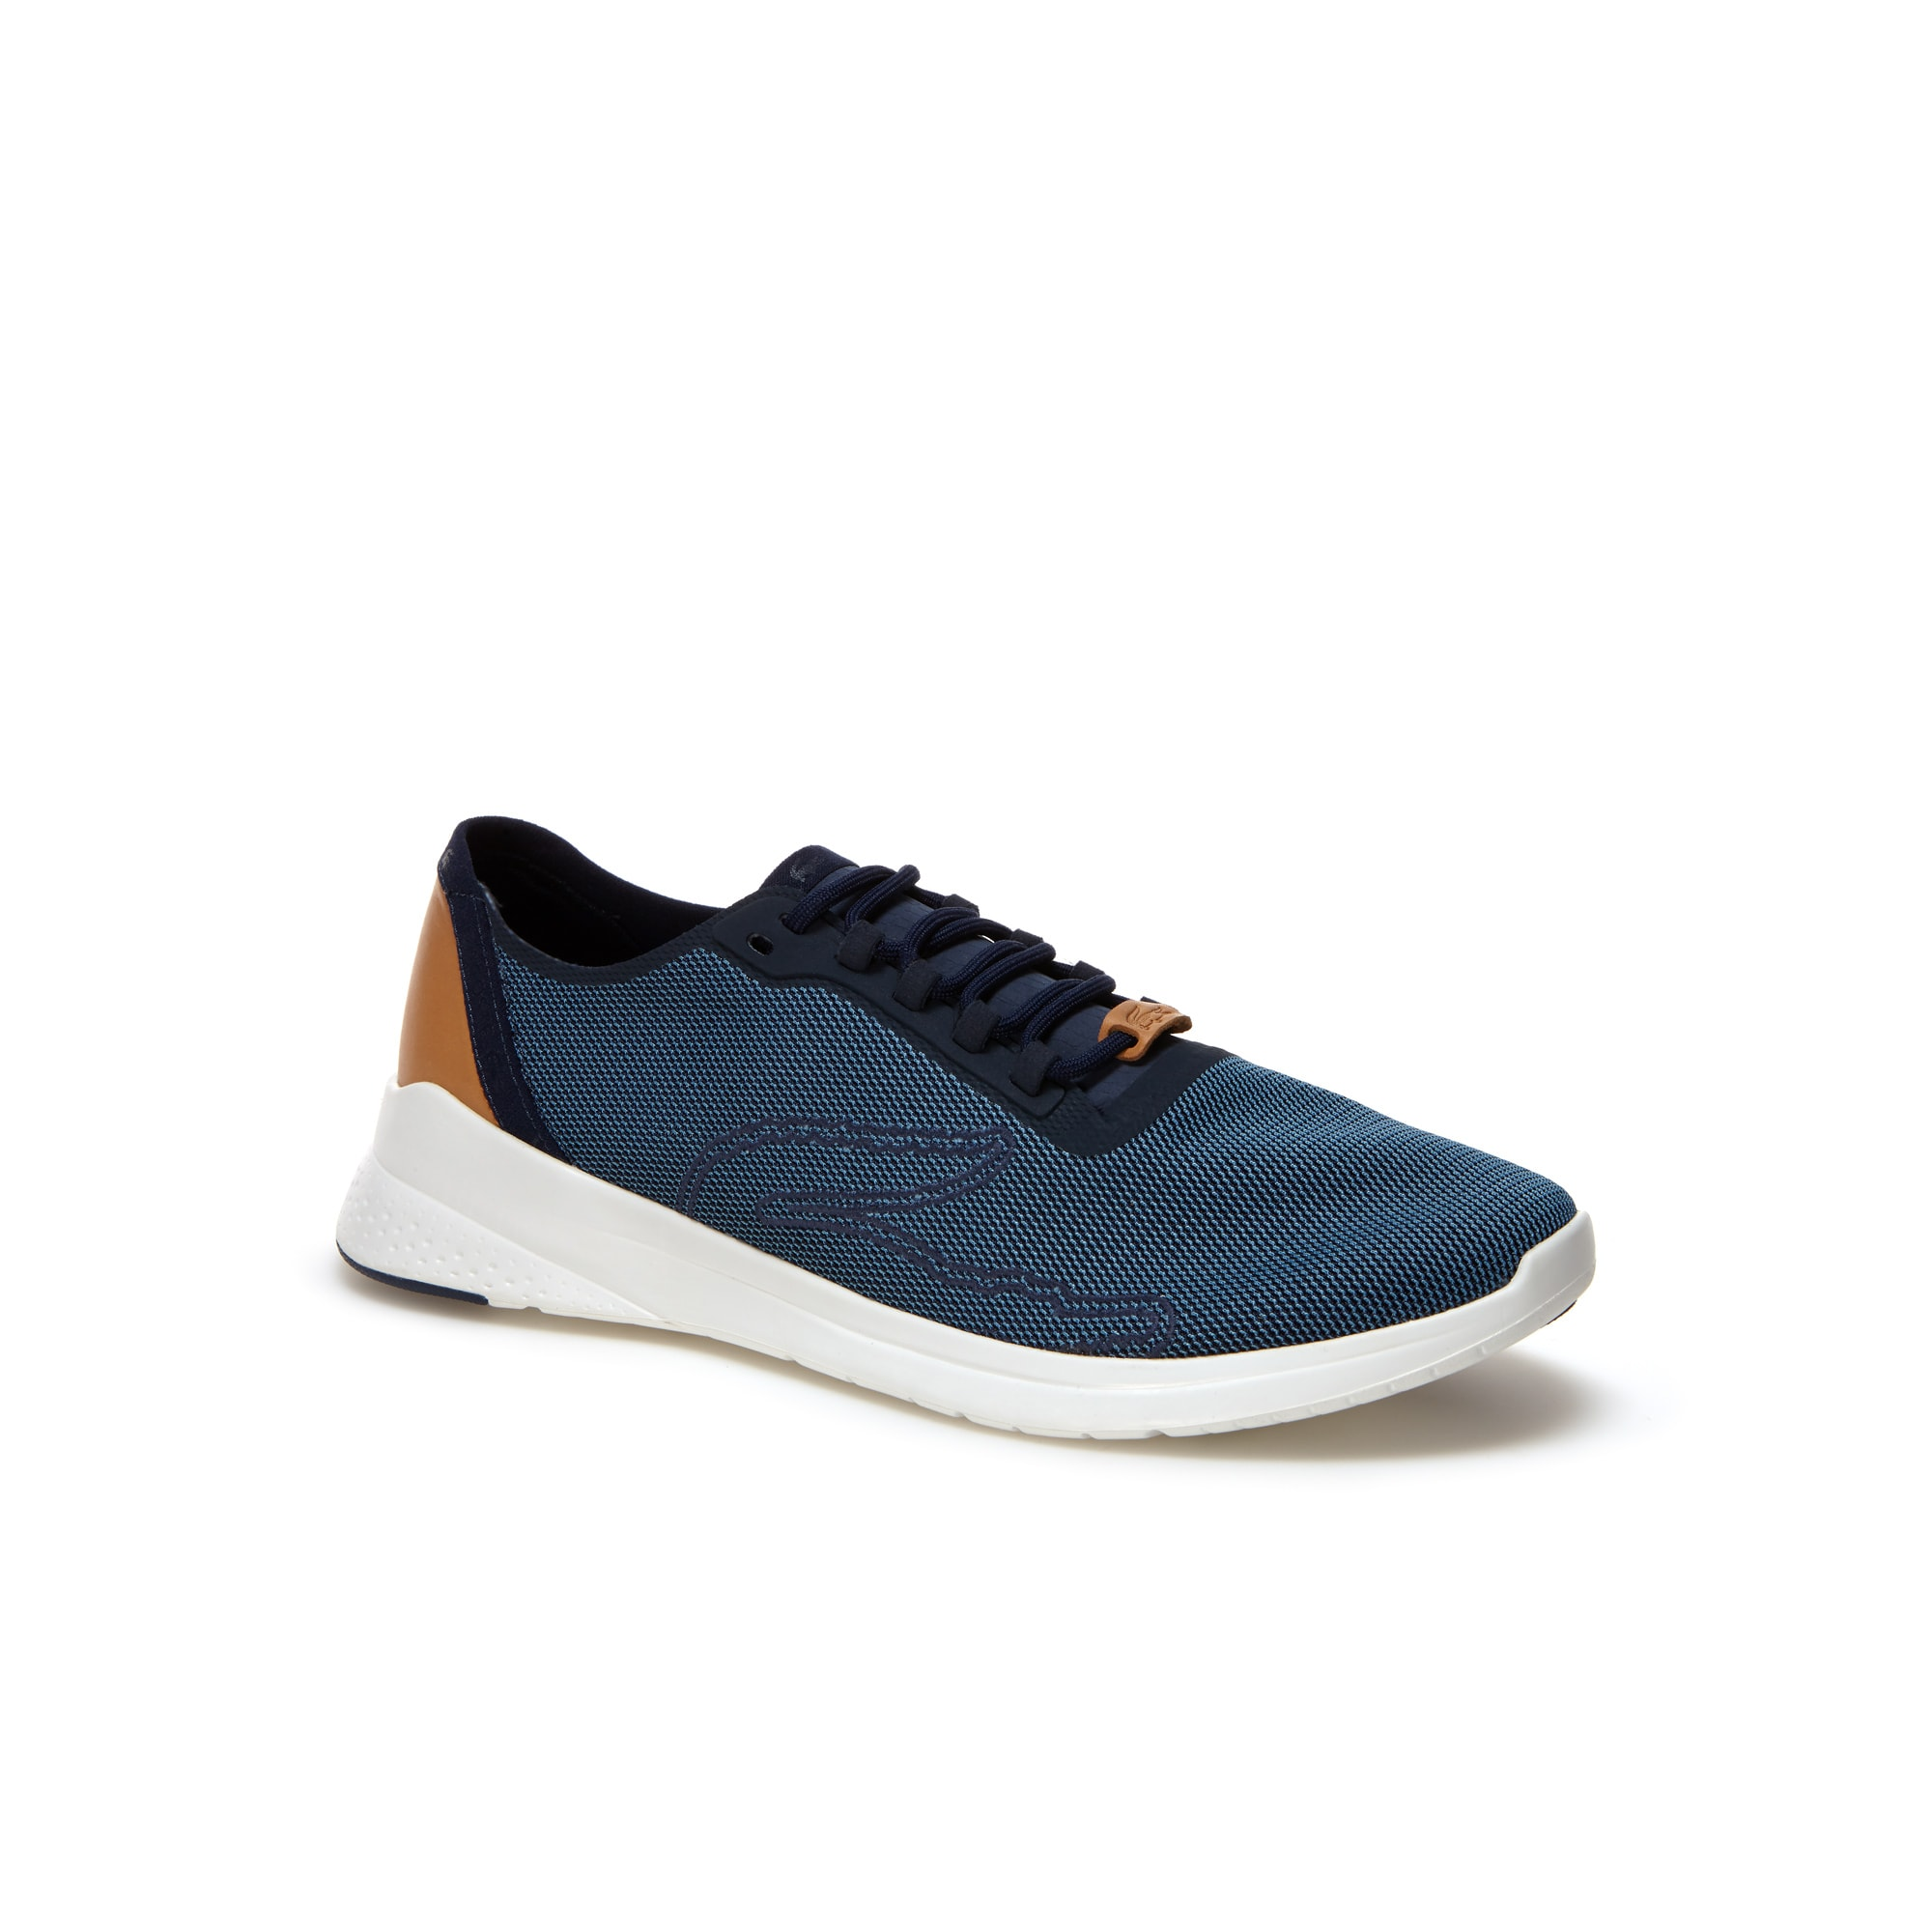 Herren-Sneakers LT FIT aus Stoff